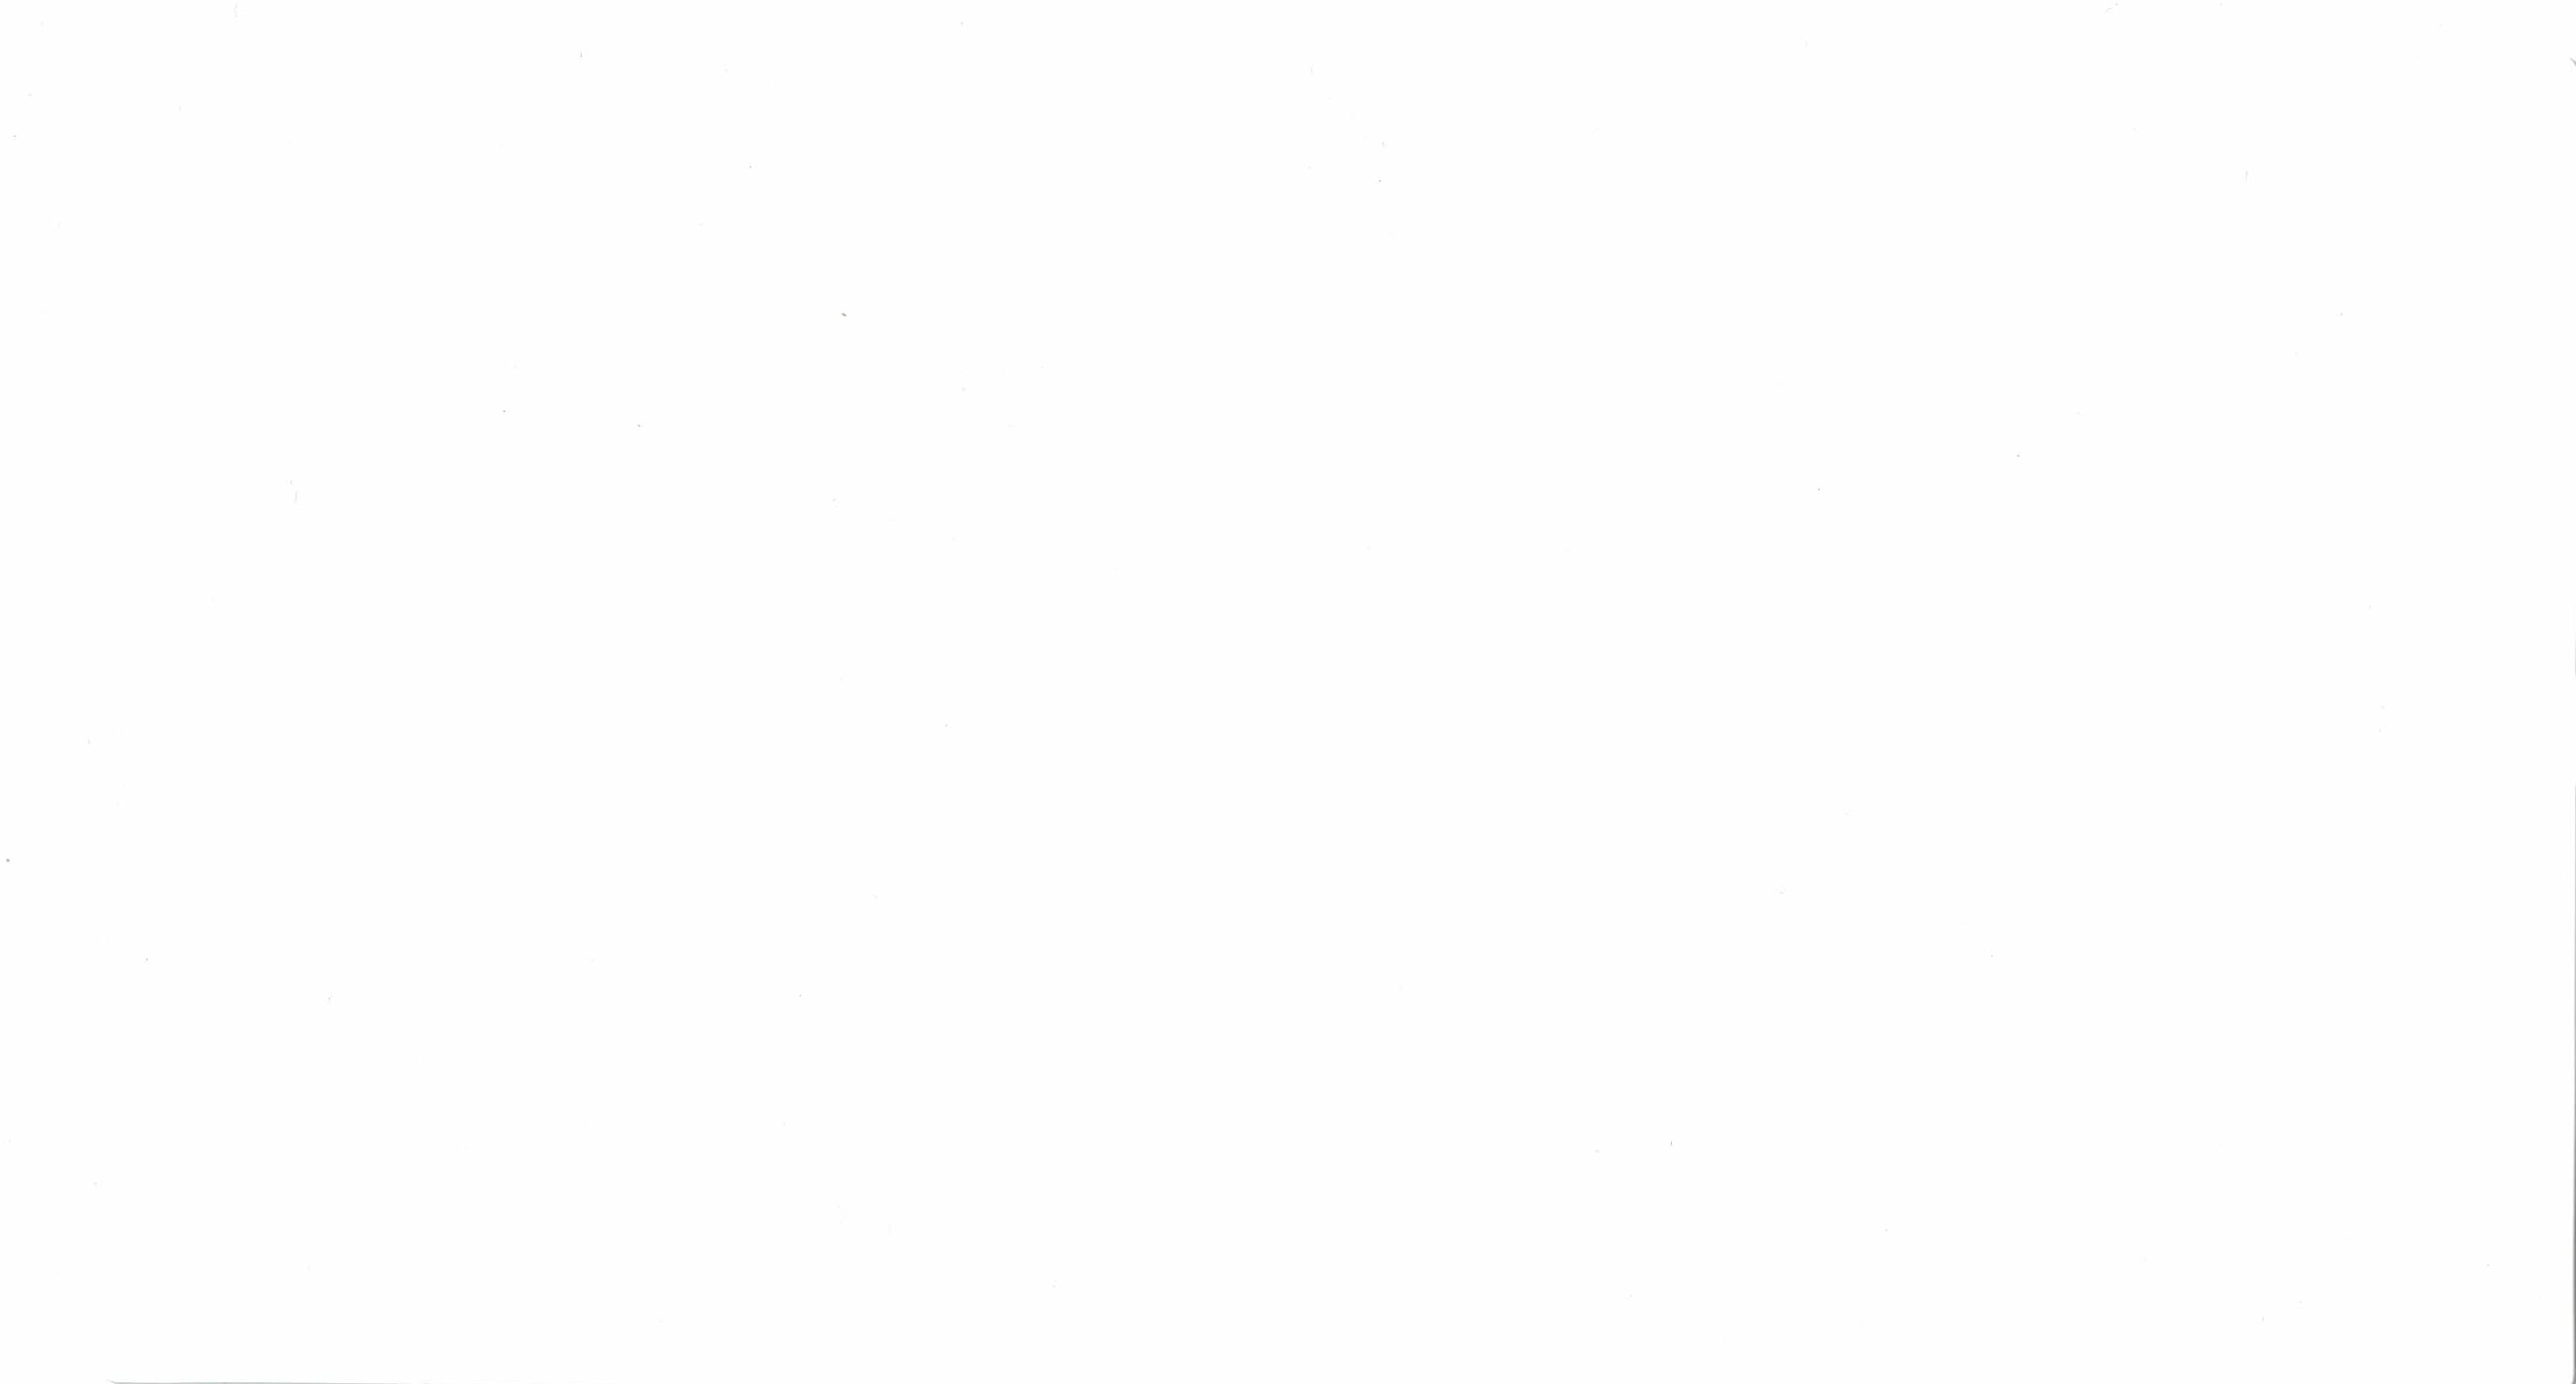 Fronskiva Lead-Led 16-7200-11  20180125